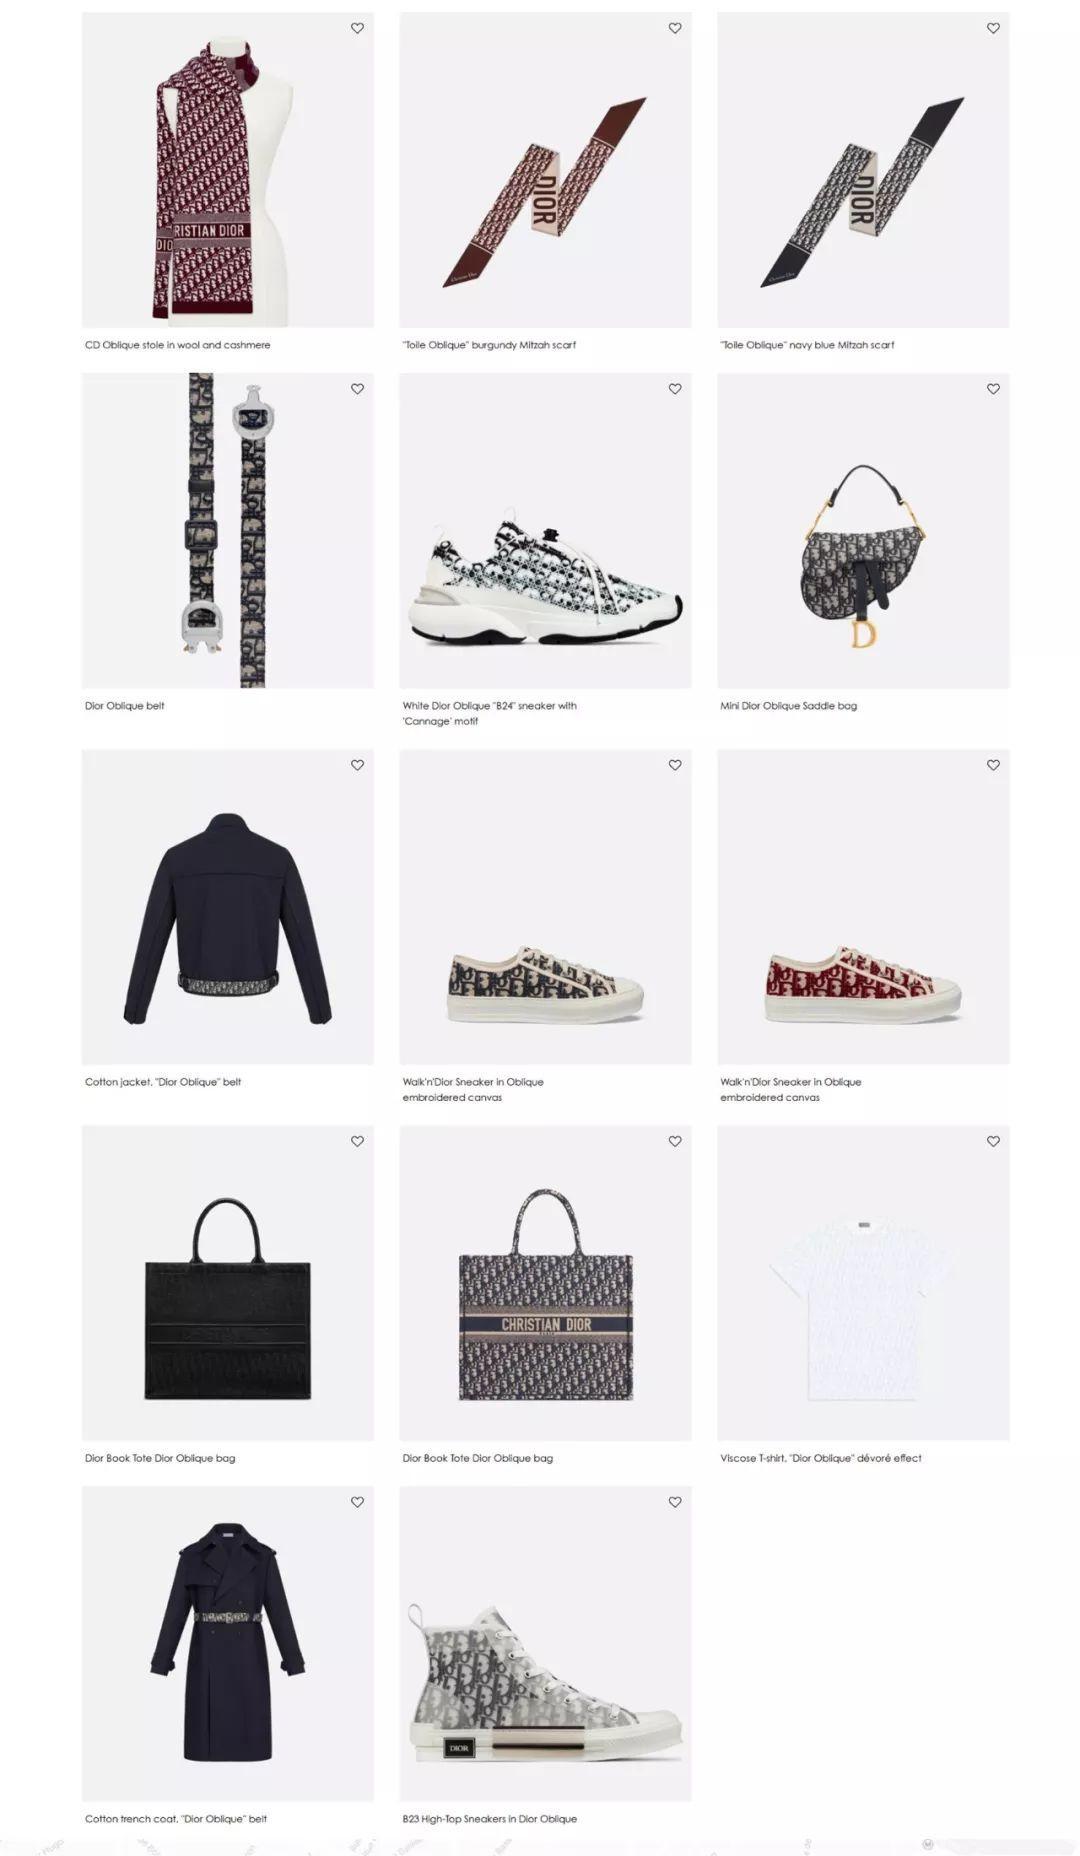 Kim Jones操刀新一季Dior迪奥夏季新球鞋公布,官网开启发售!